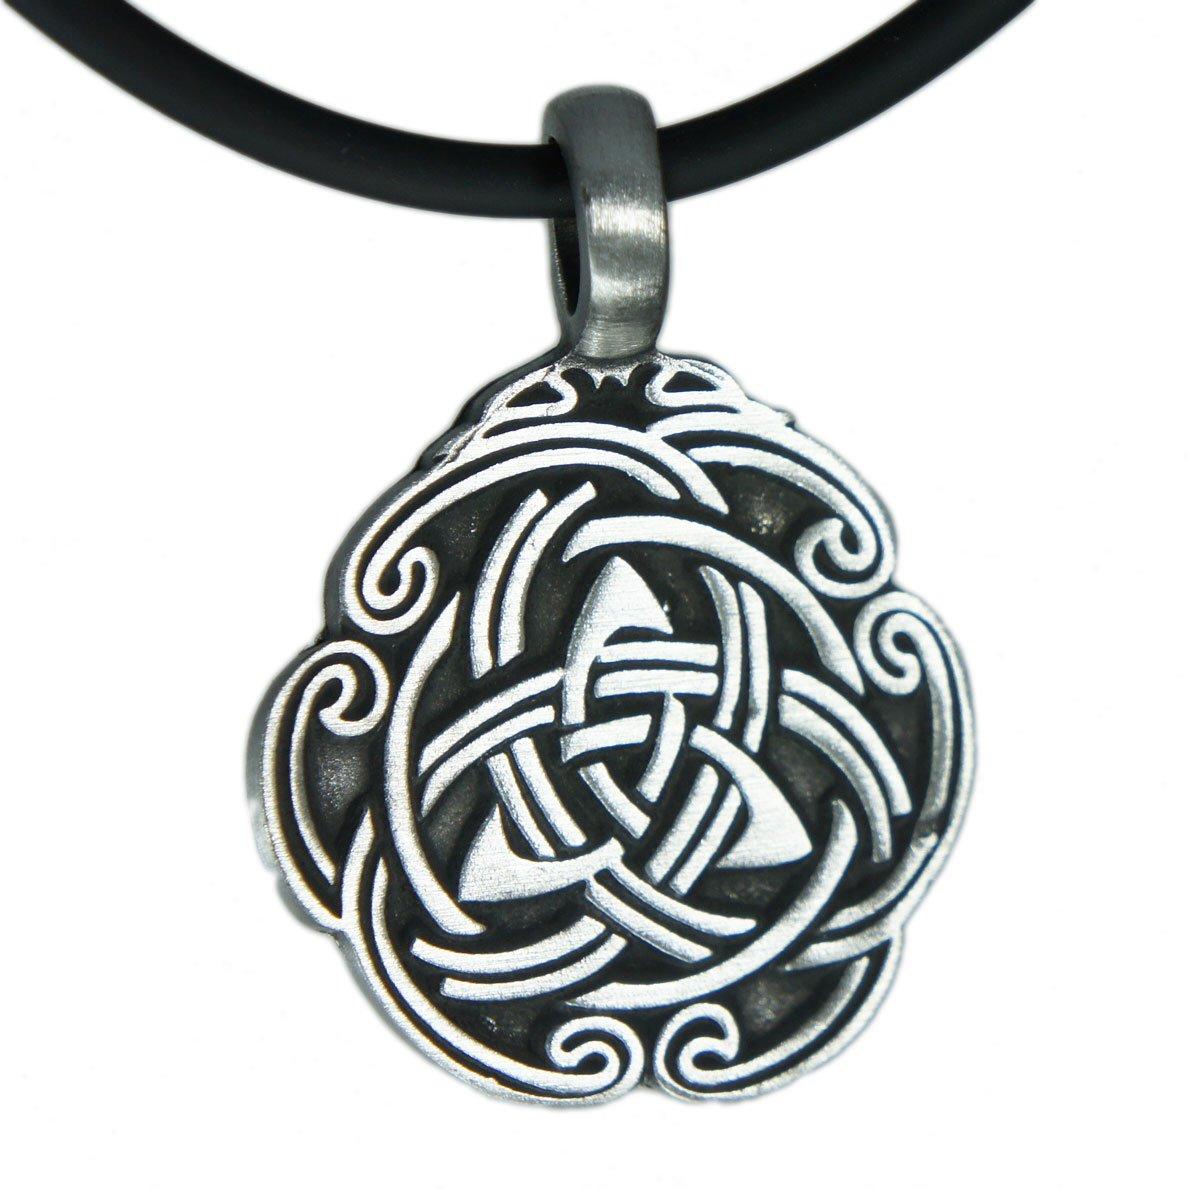 EXOTICDREAM Triquetra Knot Trinity Celtic Triskelion Triskele Pewter Pendant + Pvc Necklace Lobster Clap Lock XX